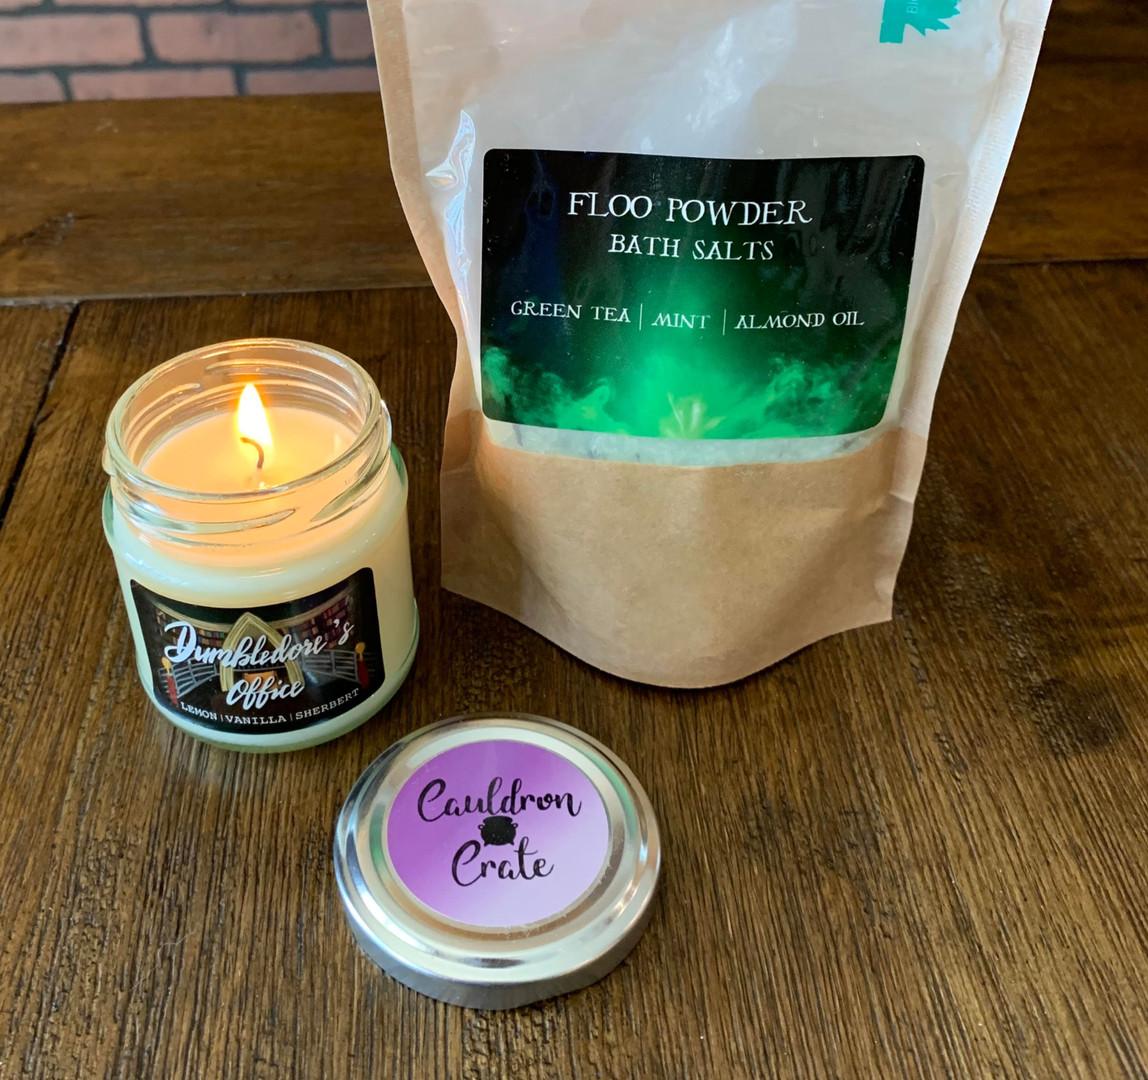 Headmasters Office Candle and Floo Powder Bath Salts